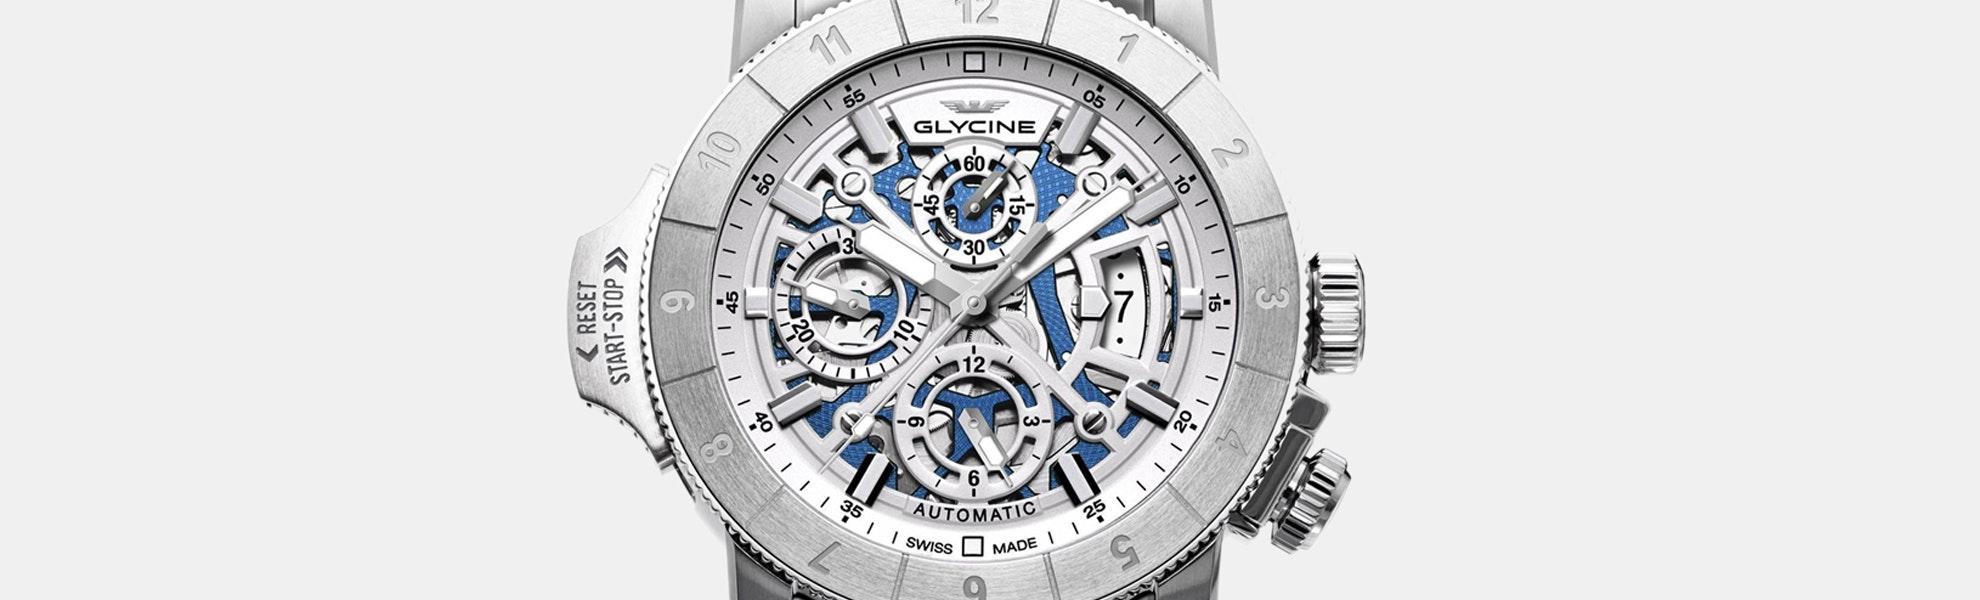 Glycine Airman Airfighter Skeleton Automatic Watch